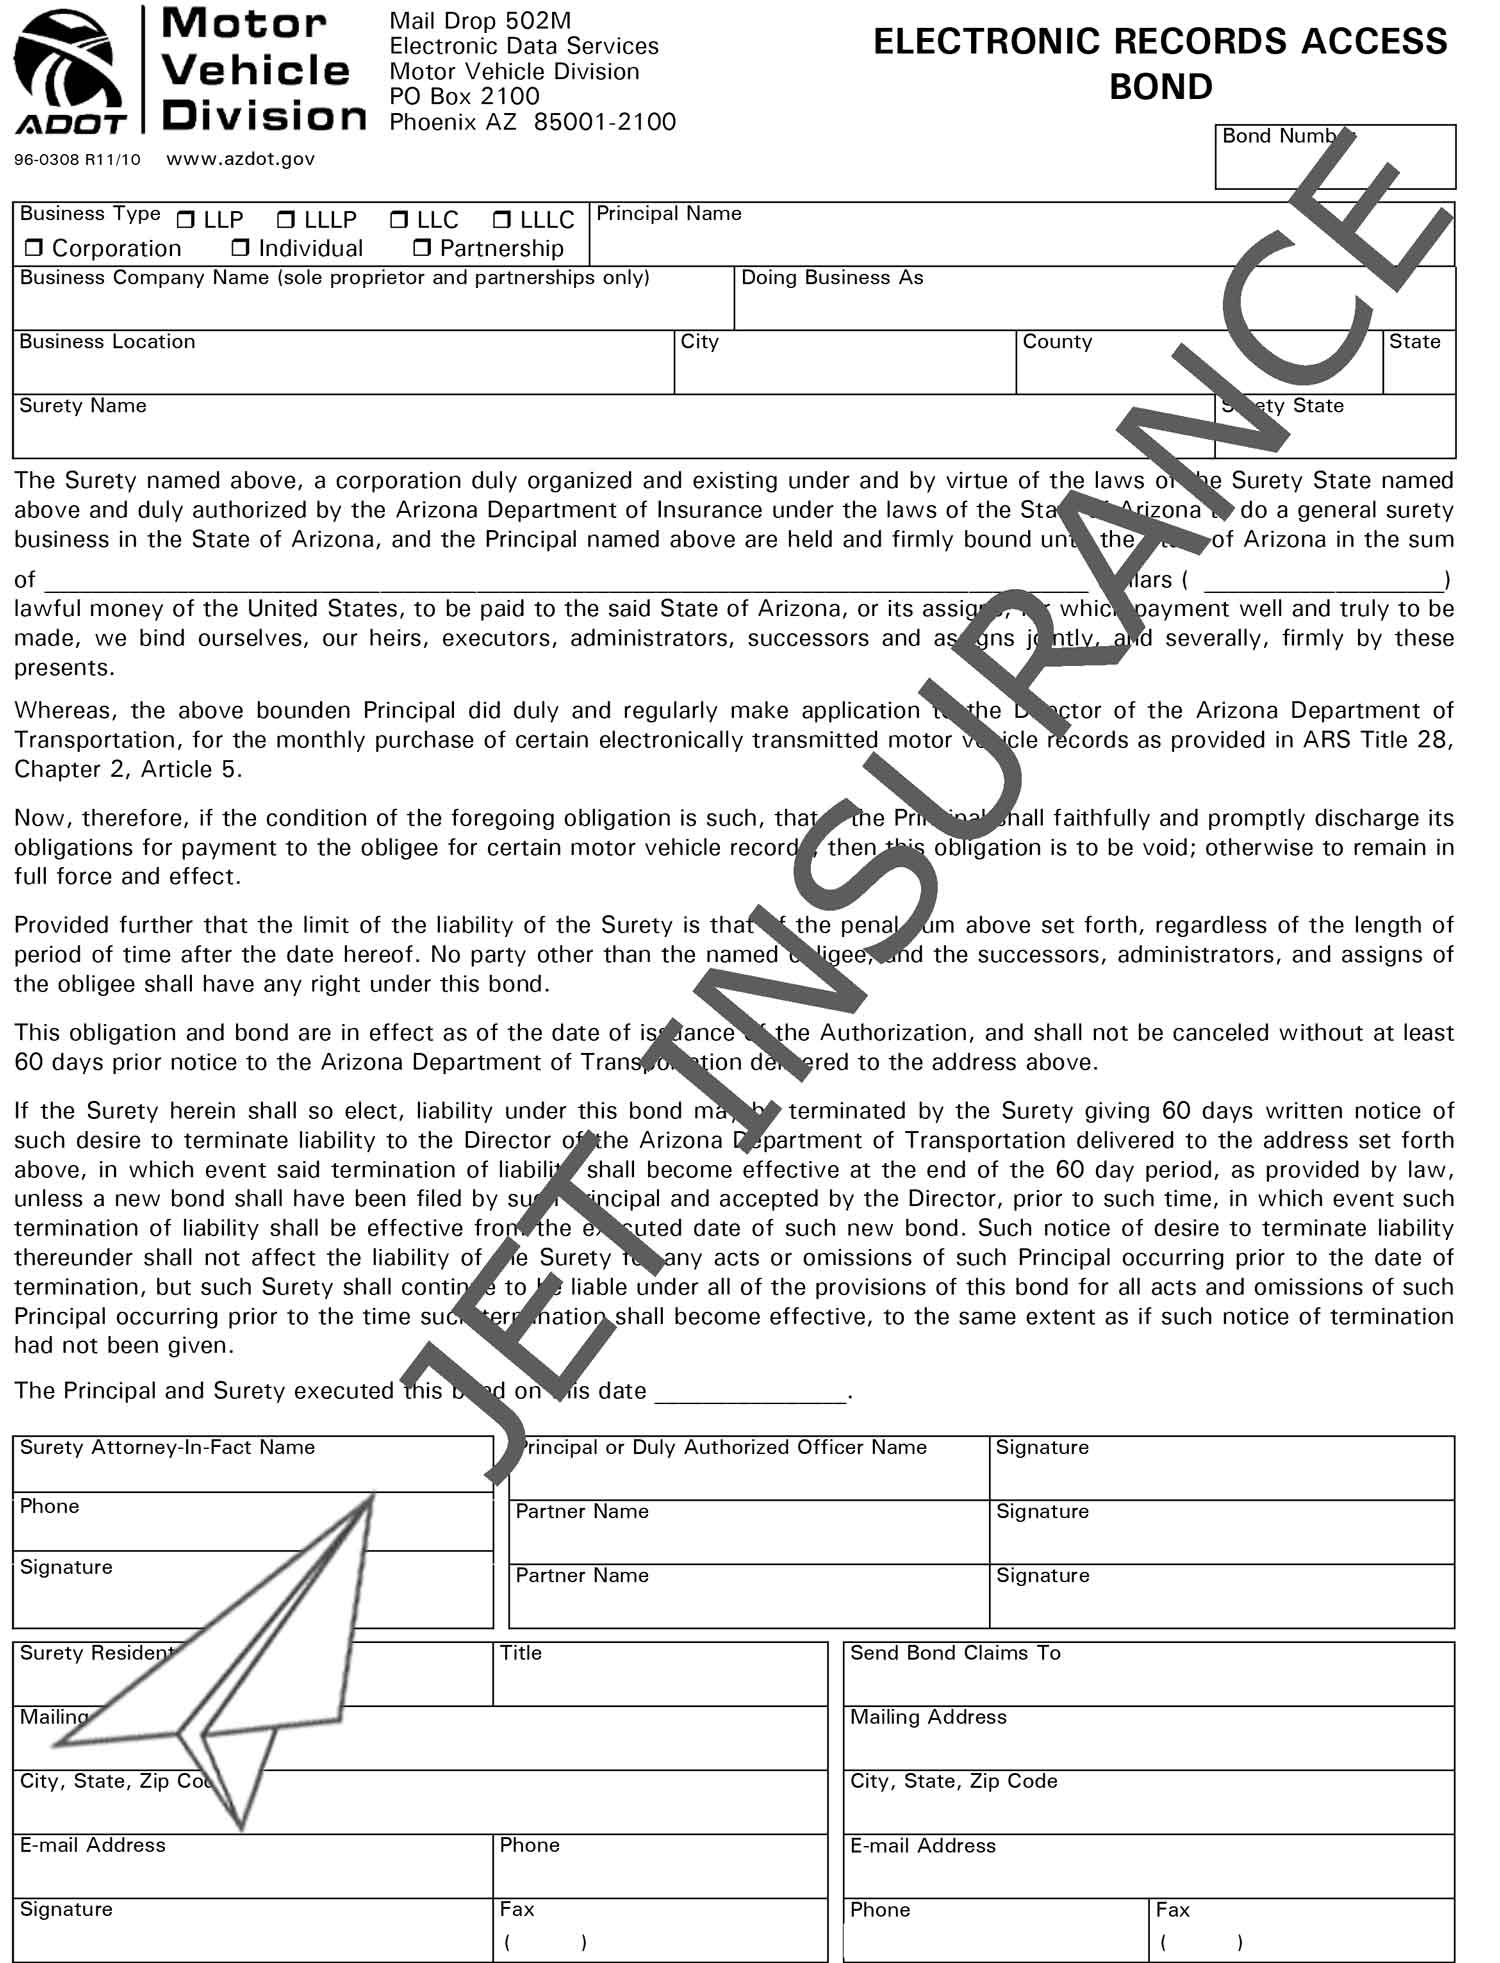 Arizona Electronic Records Access Bond Form